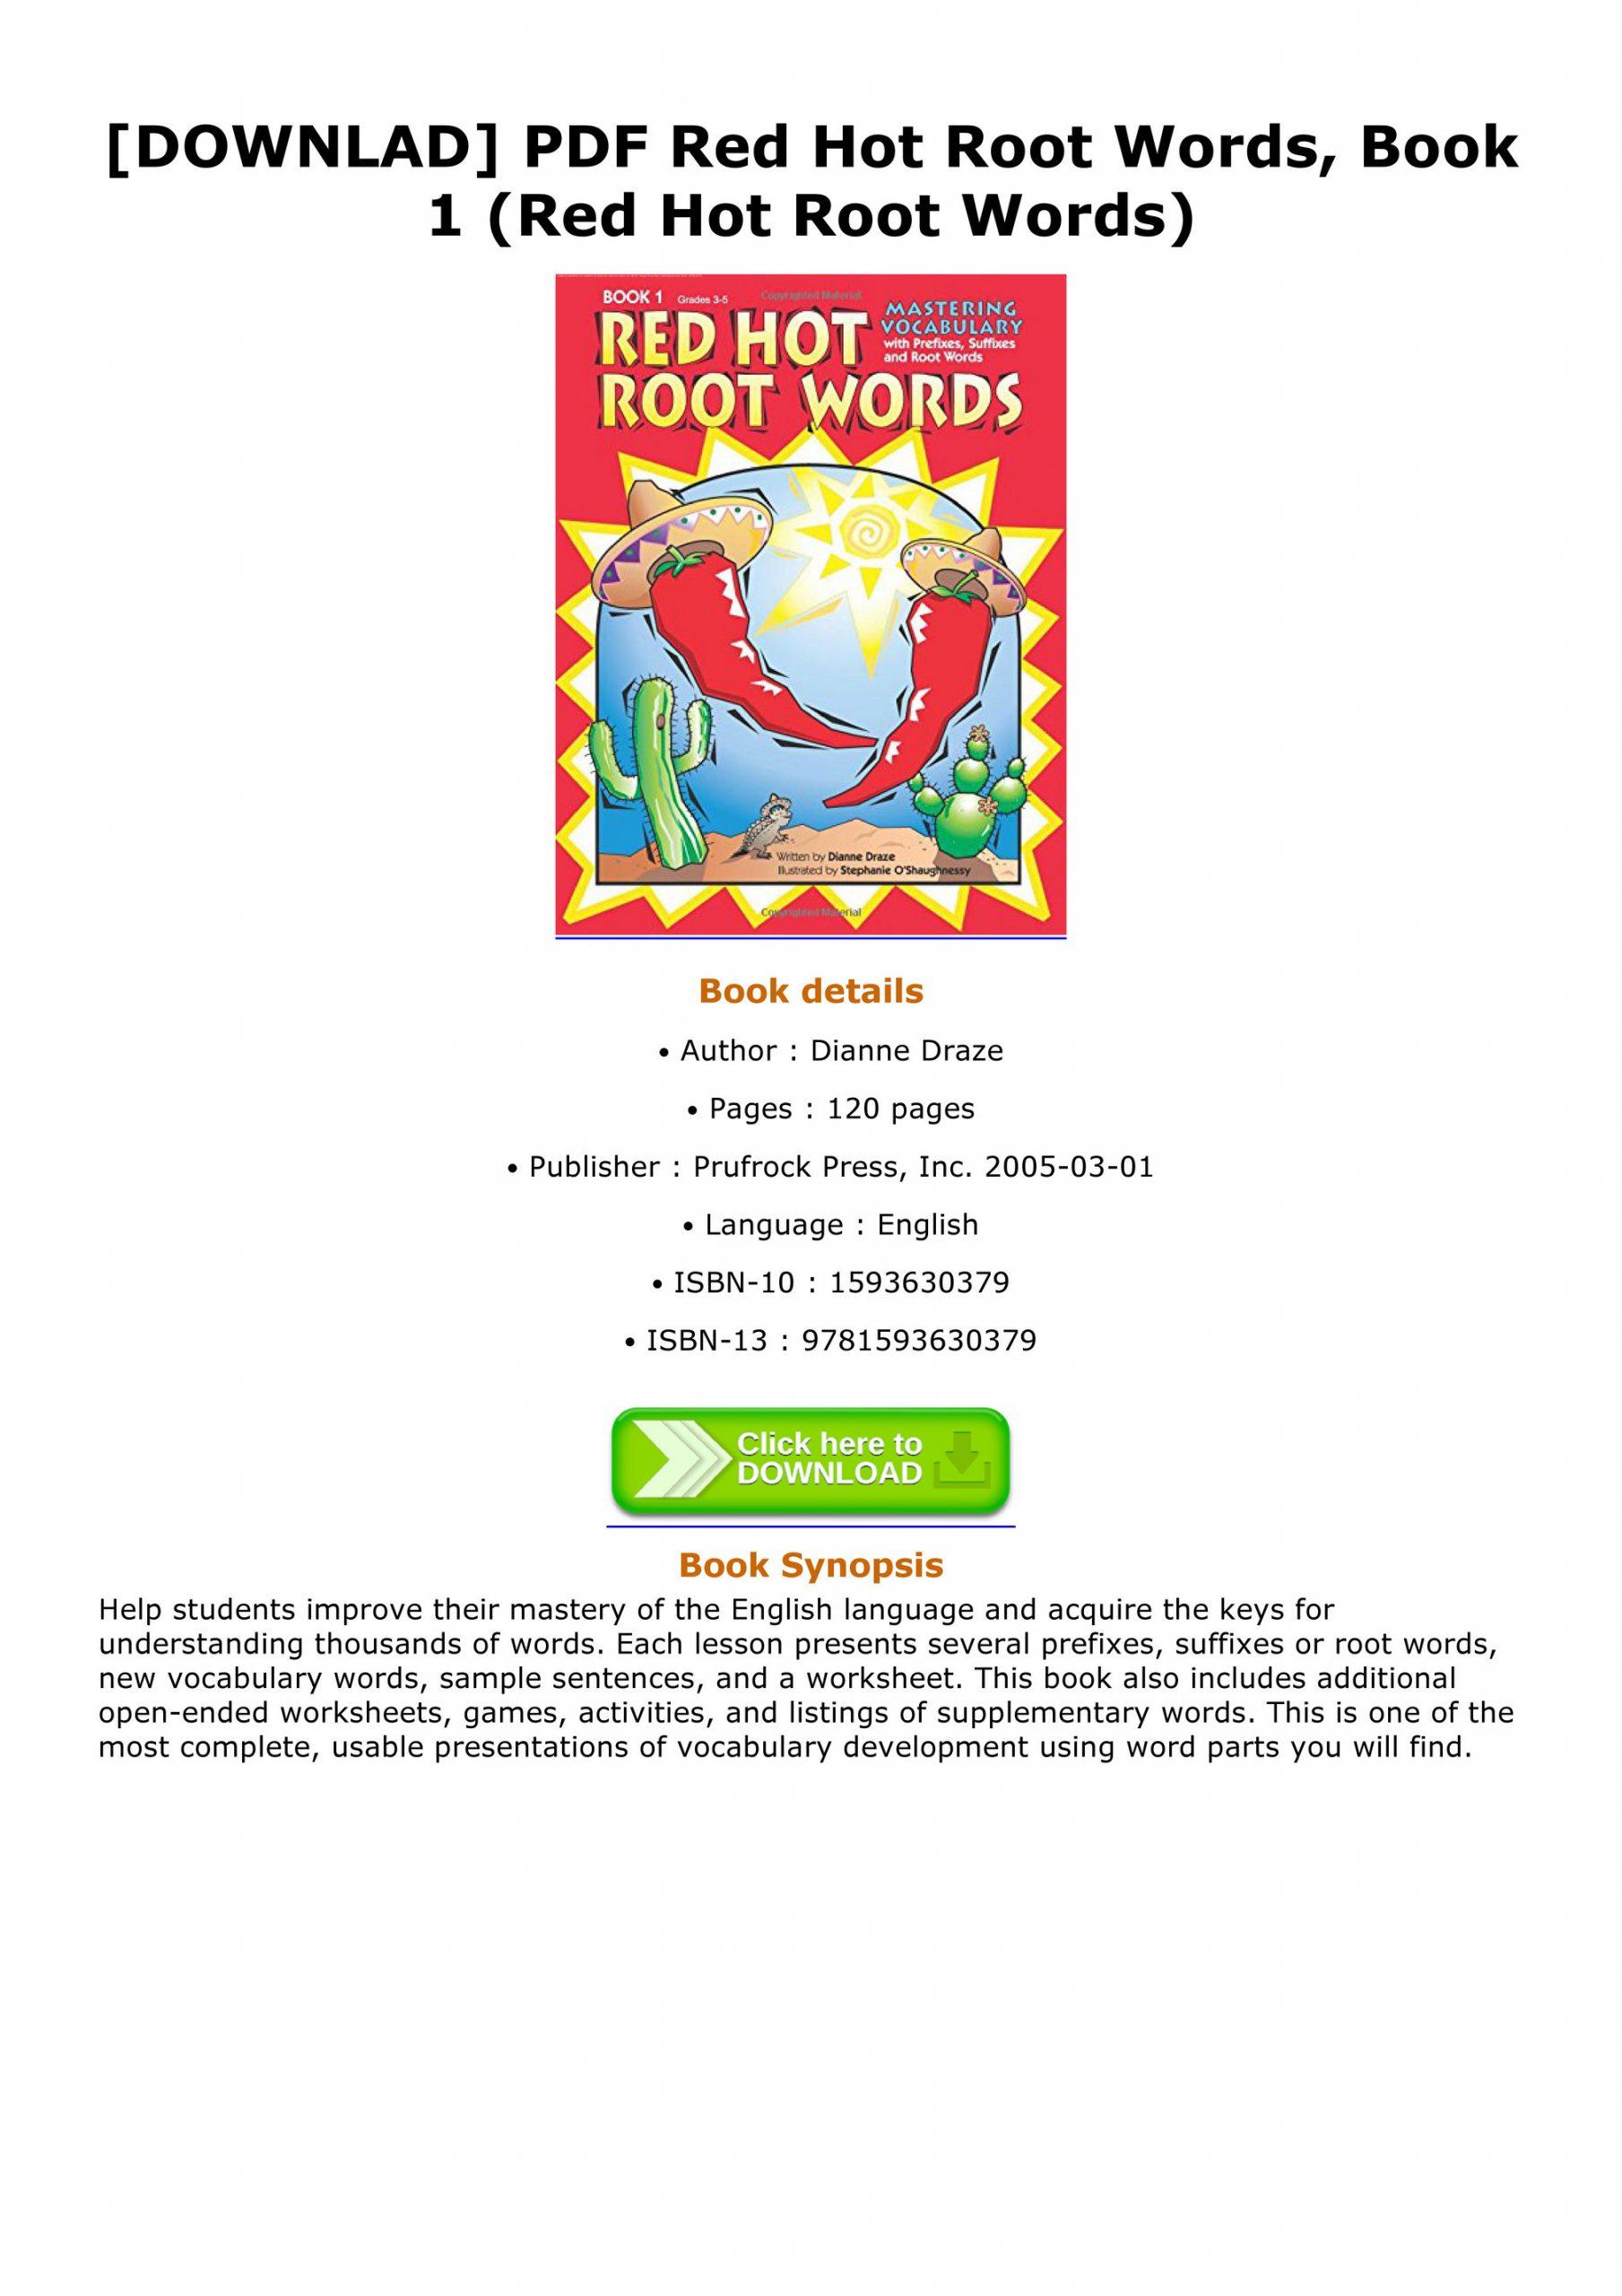 Root Words Worksheet Pdf Horacio Downlad Pdf Red Hot Root Words Book 1 Red Hot Root